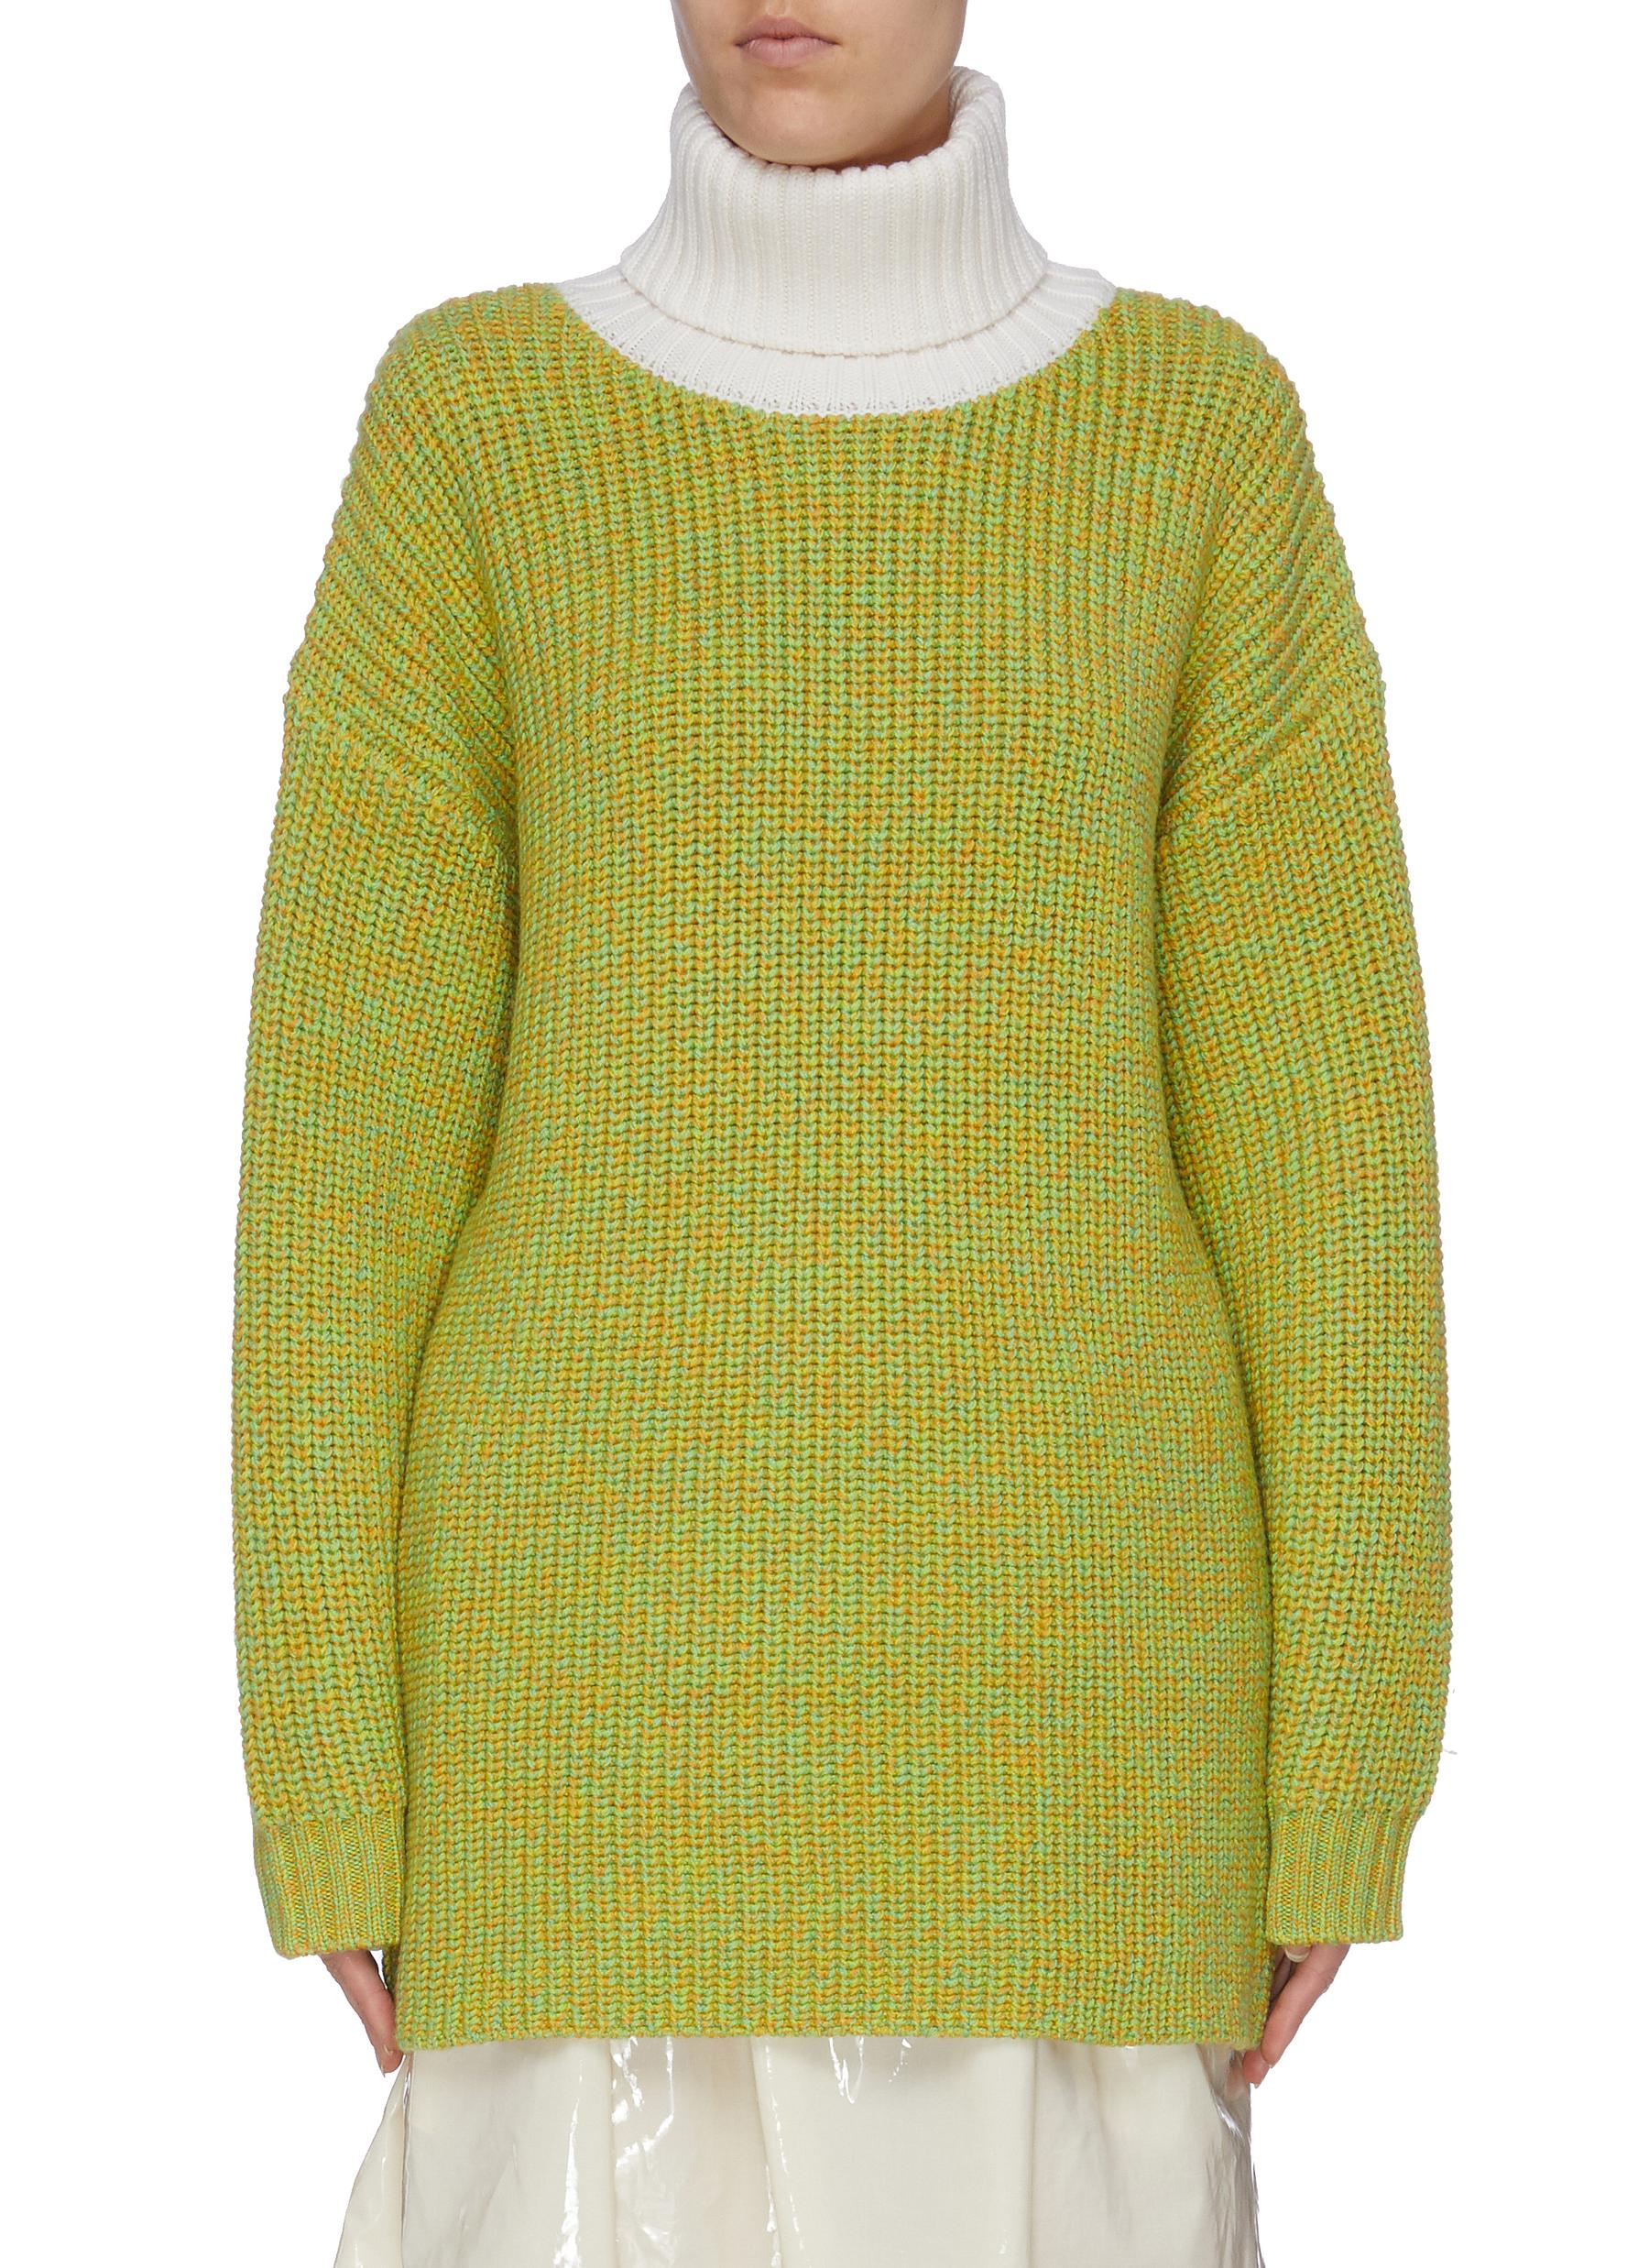 Tweedy oversized merino wool turtleneck sweater by Tibi